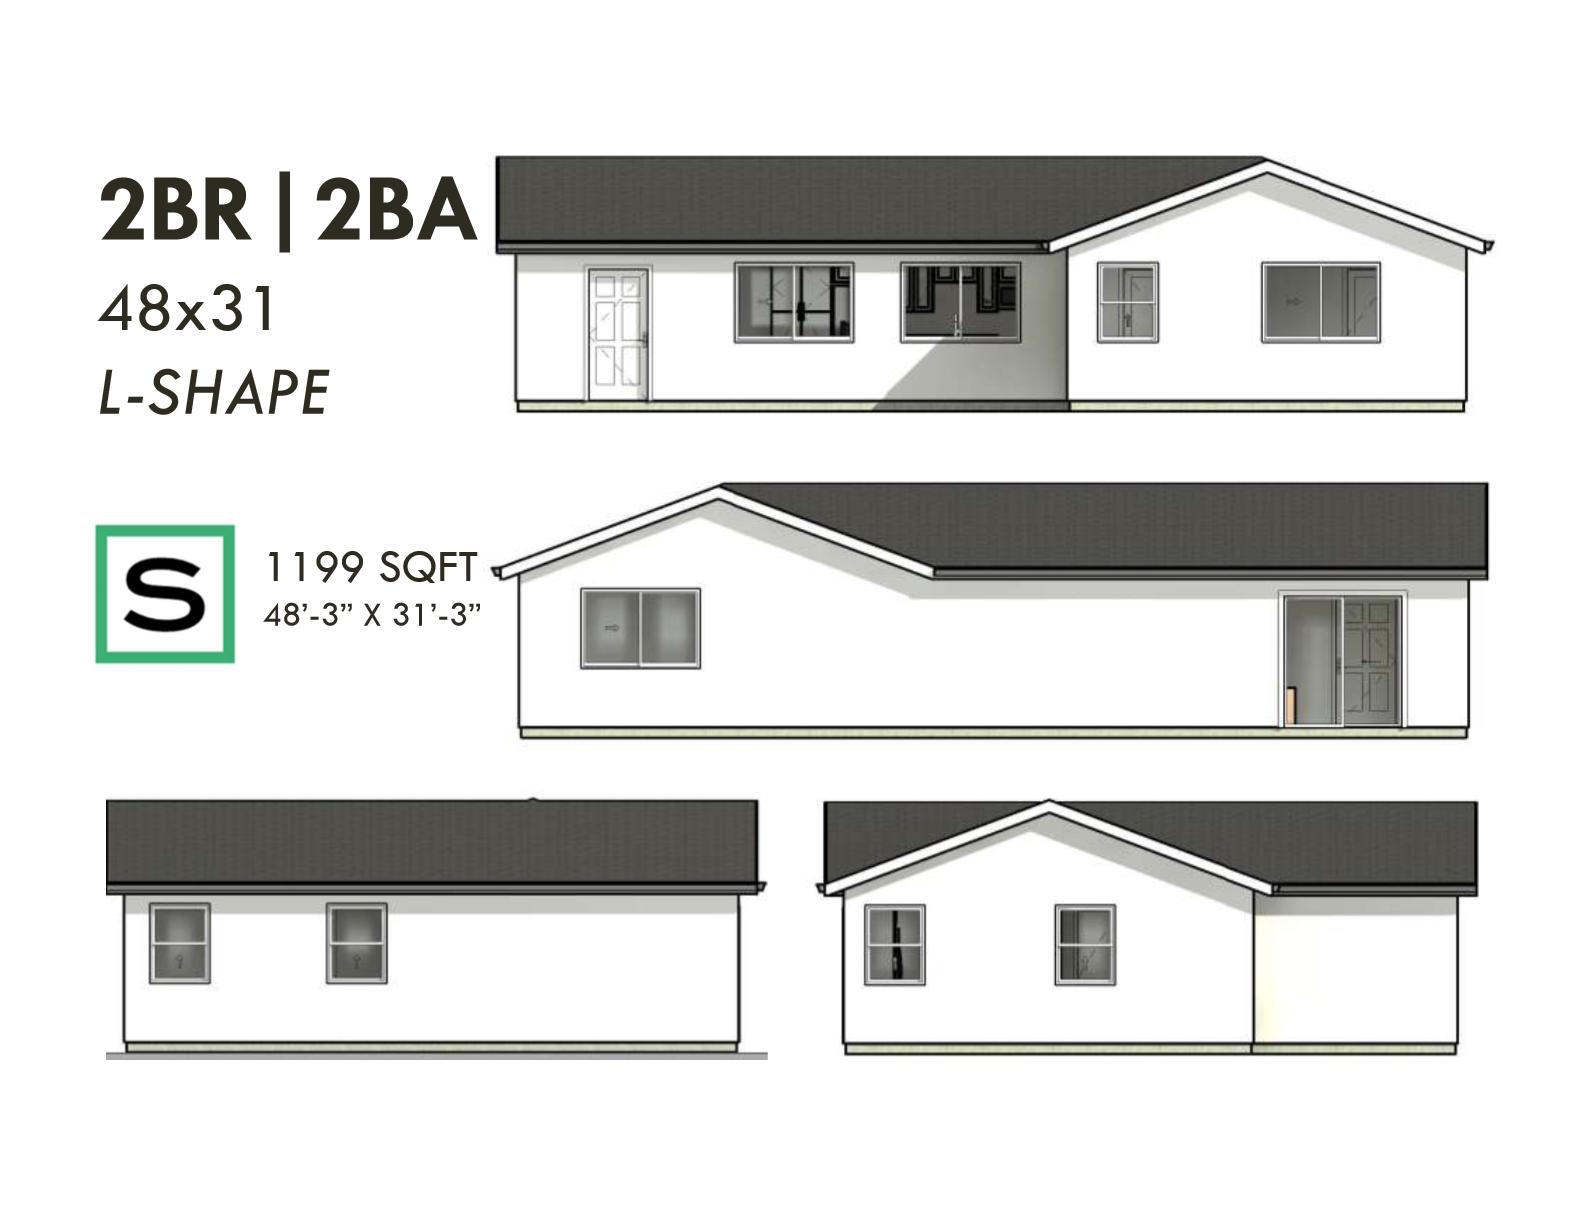 2BR2BA 1199 SF 48x31 L-SHAPE ADU ELEVATION